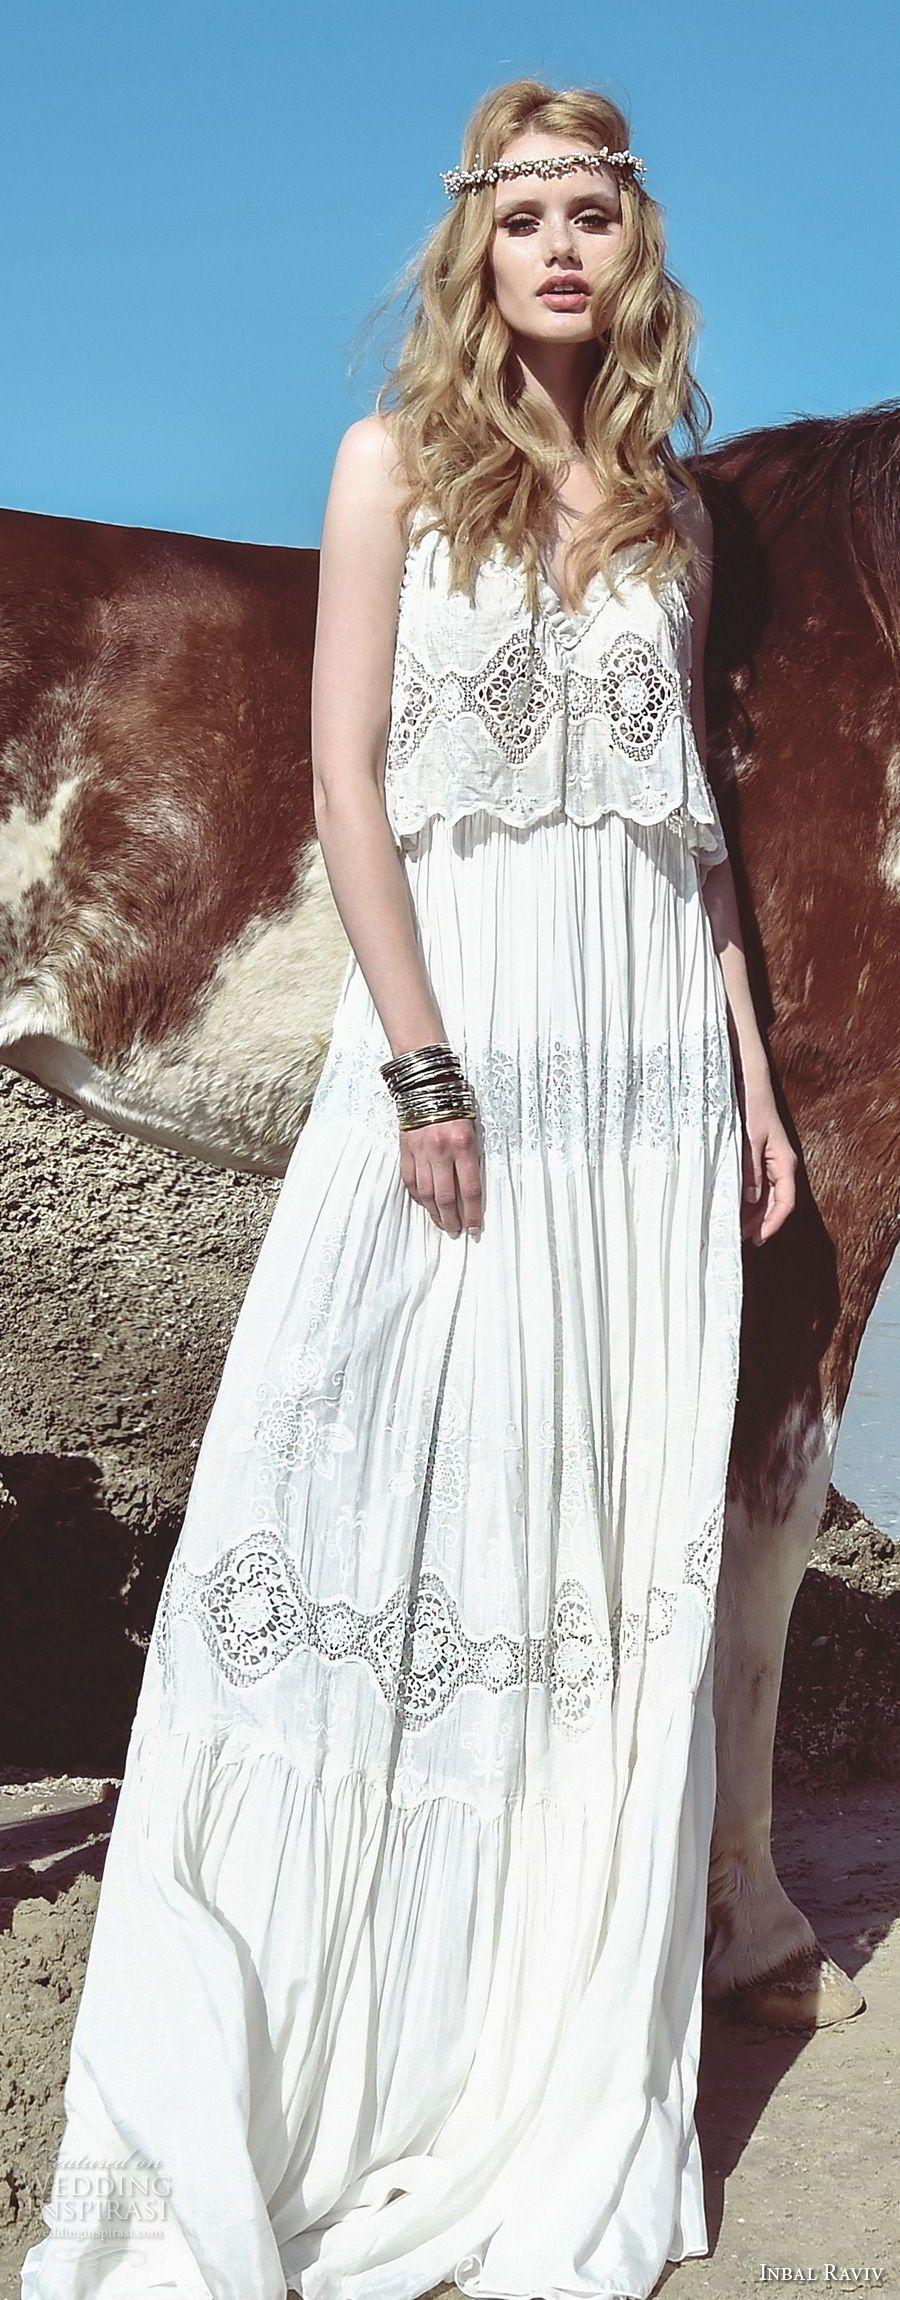 Inbal raviv wedding dresses boho chic wedding pinterest